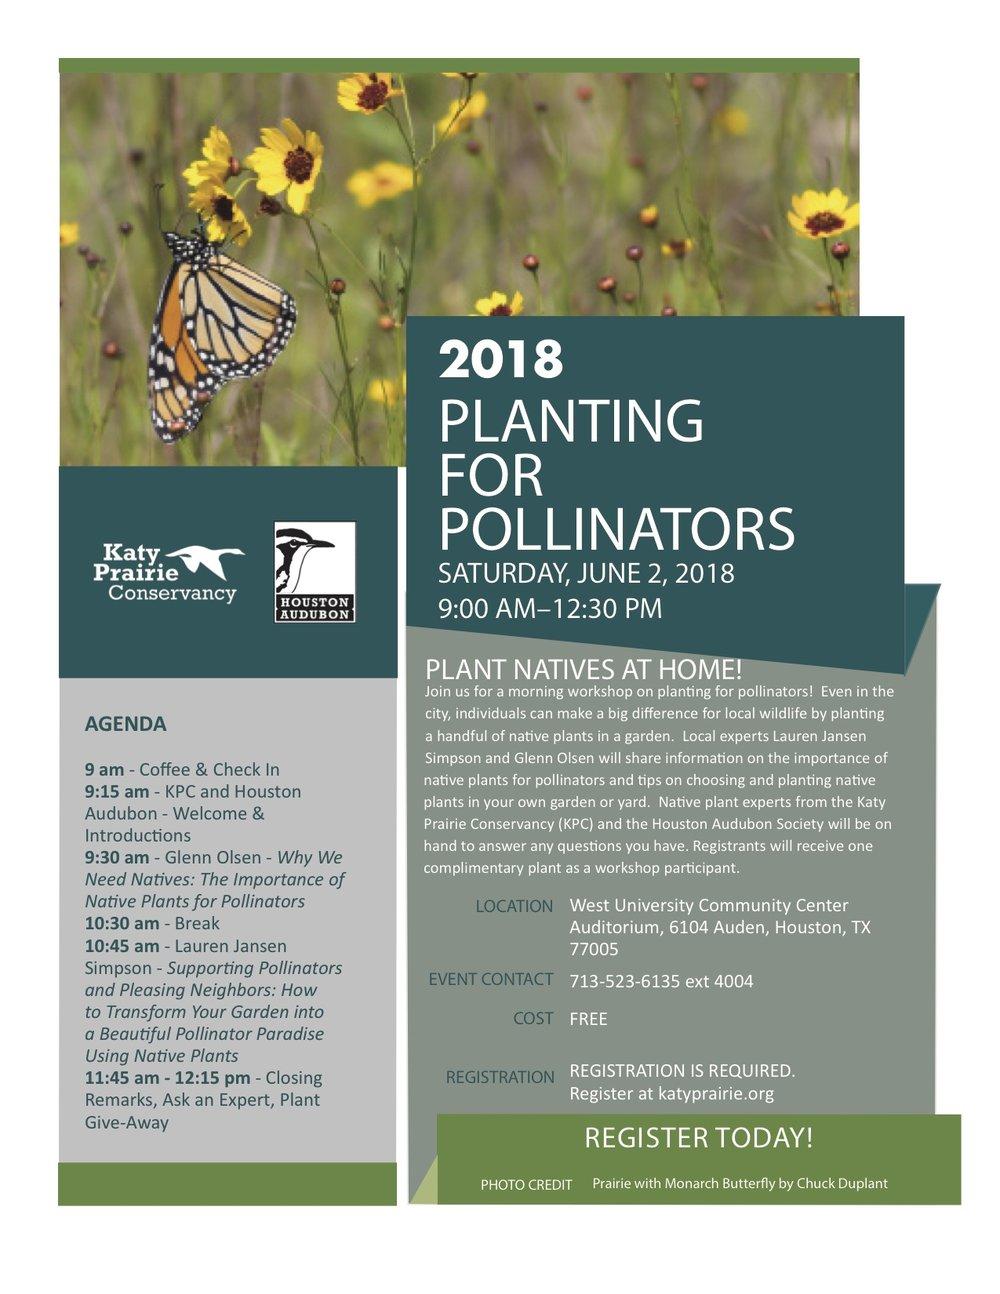 Planting for Pollinators.jpg